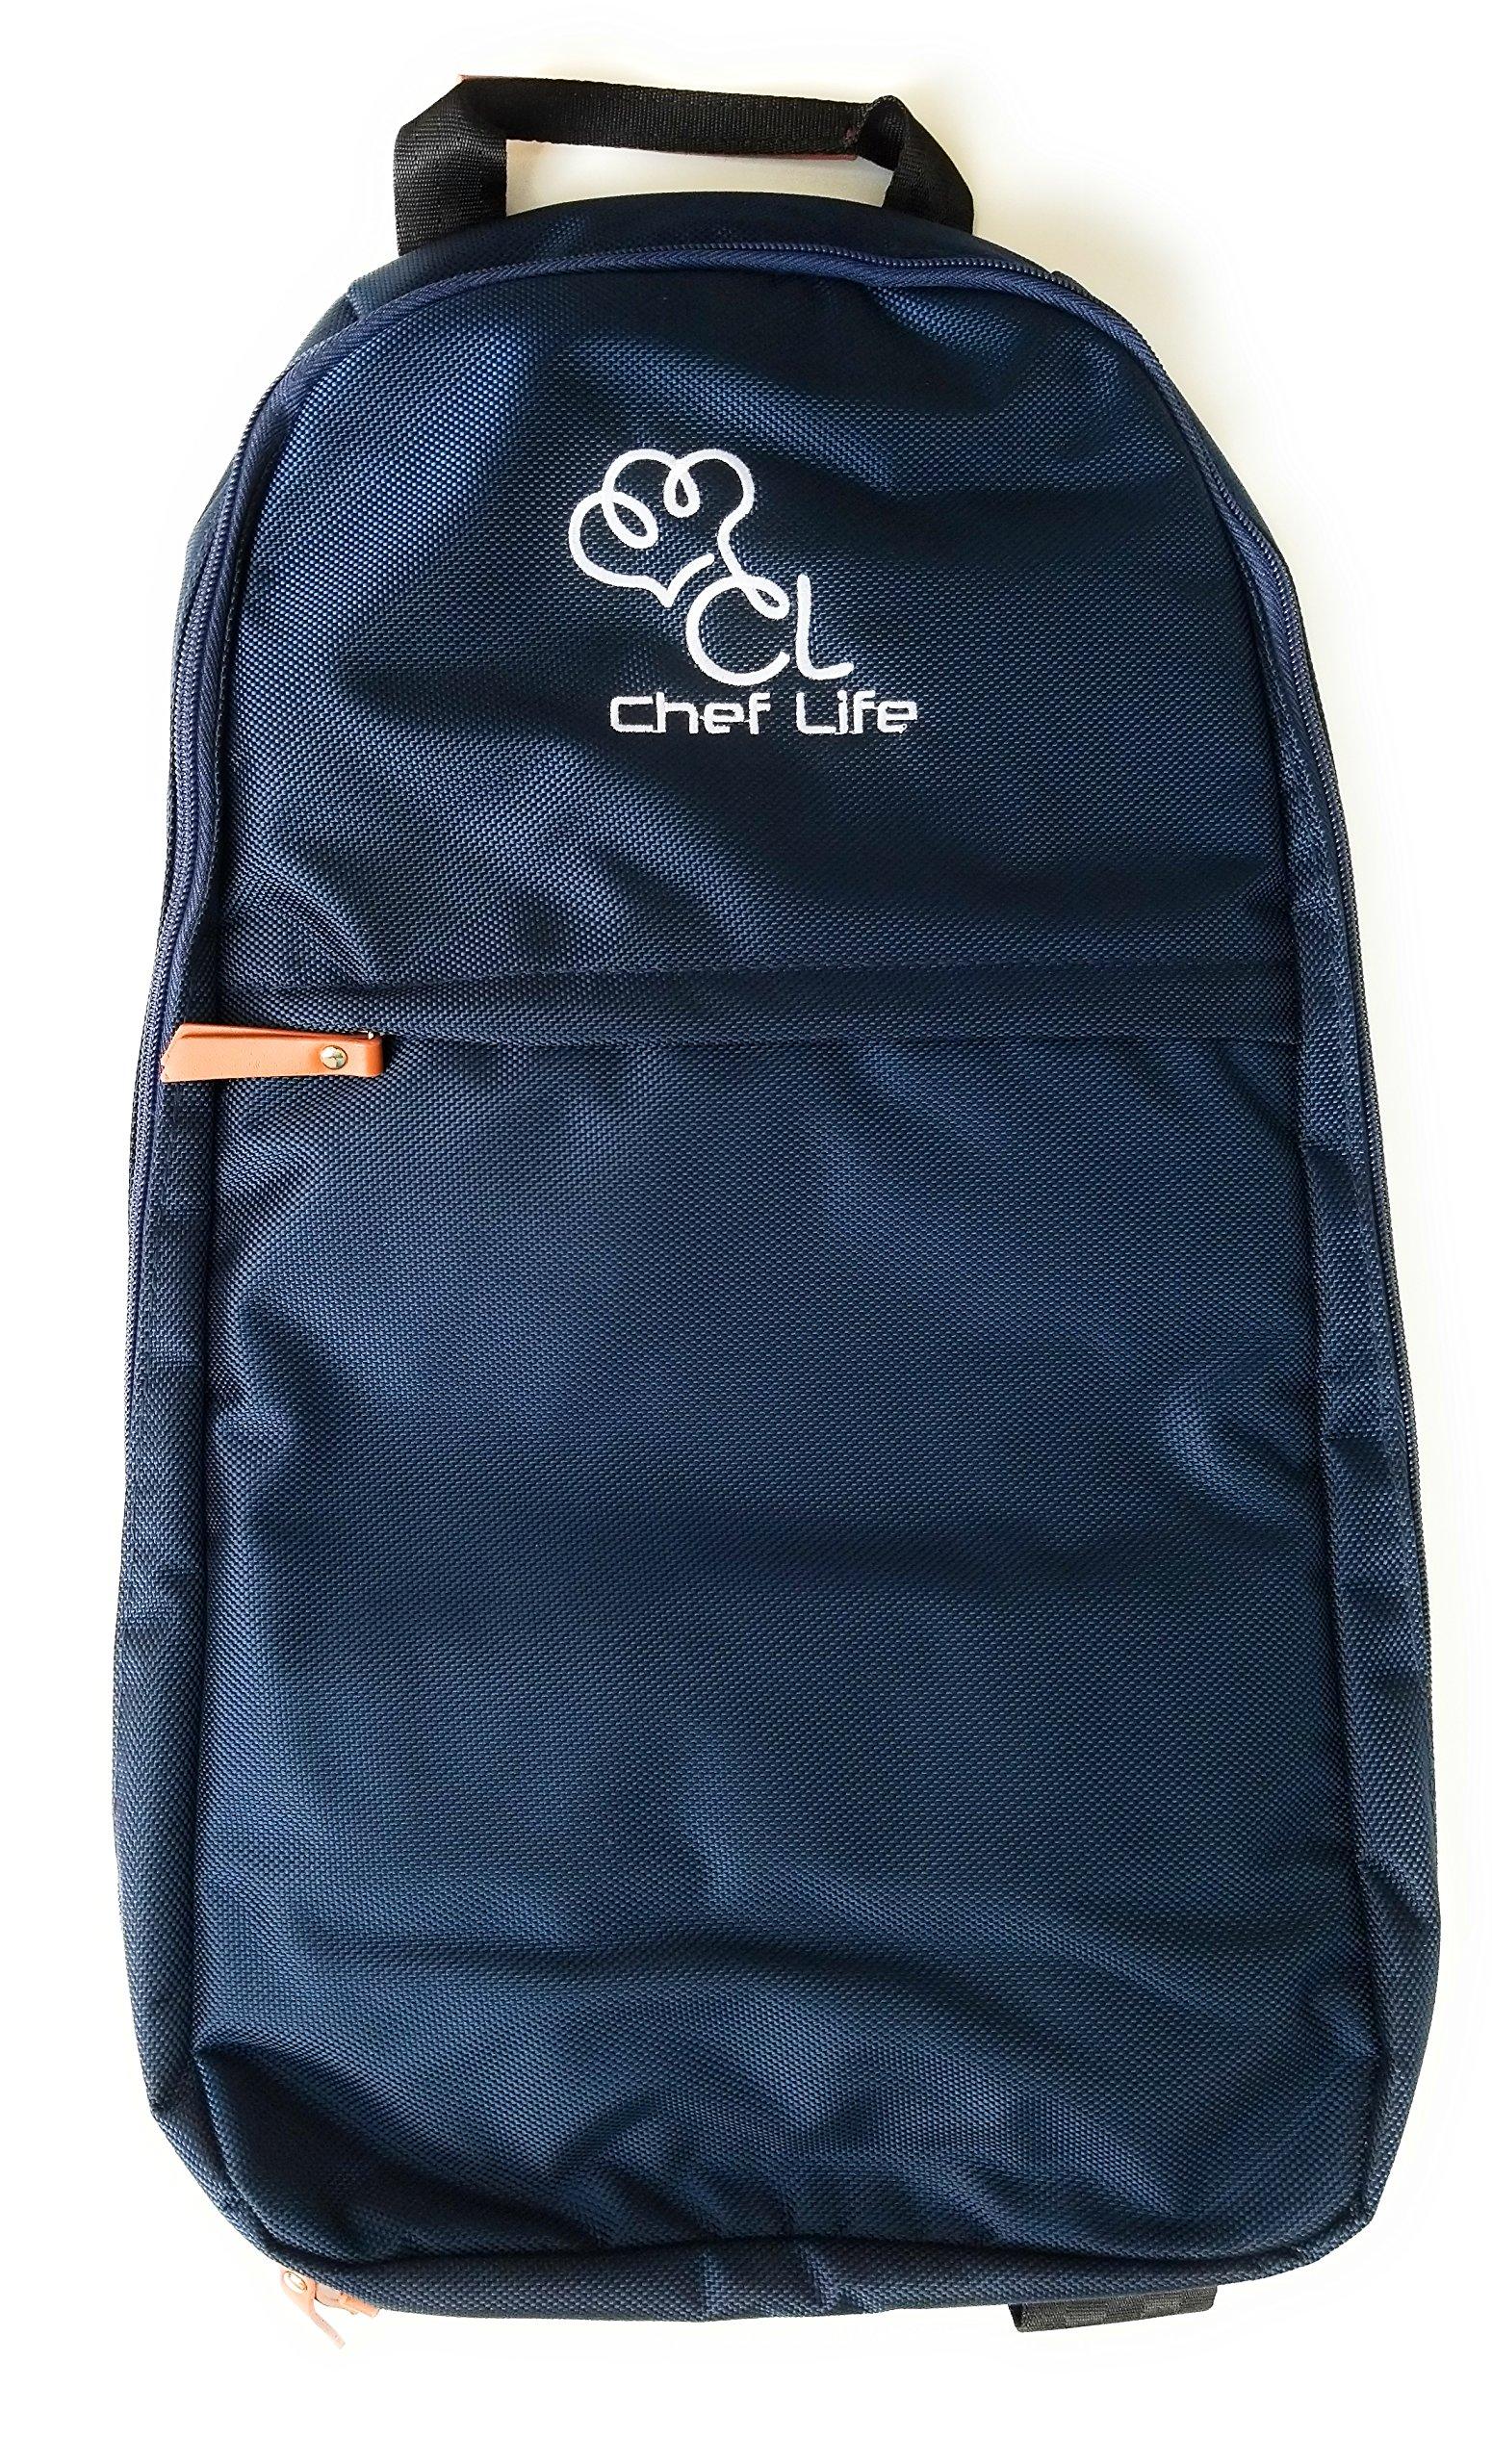 Premium Elite Ergonomic Chef Knife Backpack Roll Bag Case - 17 Pockets - Water Resistant Military Grade Ballistic Nylon